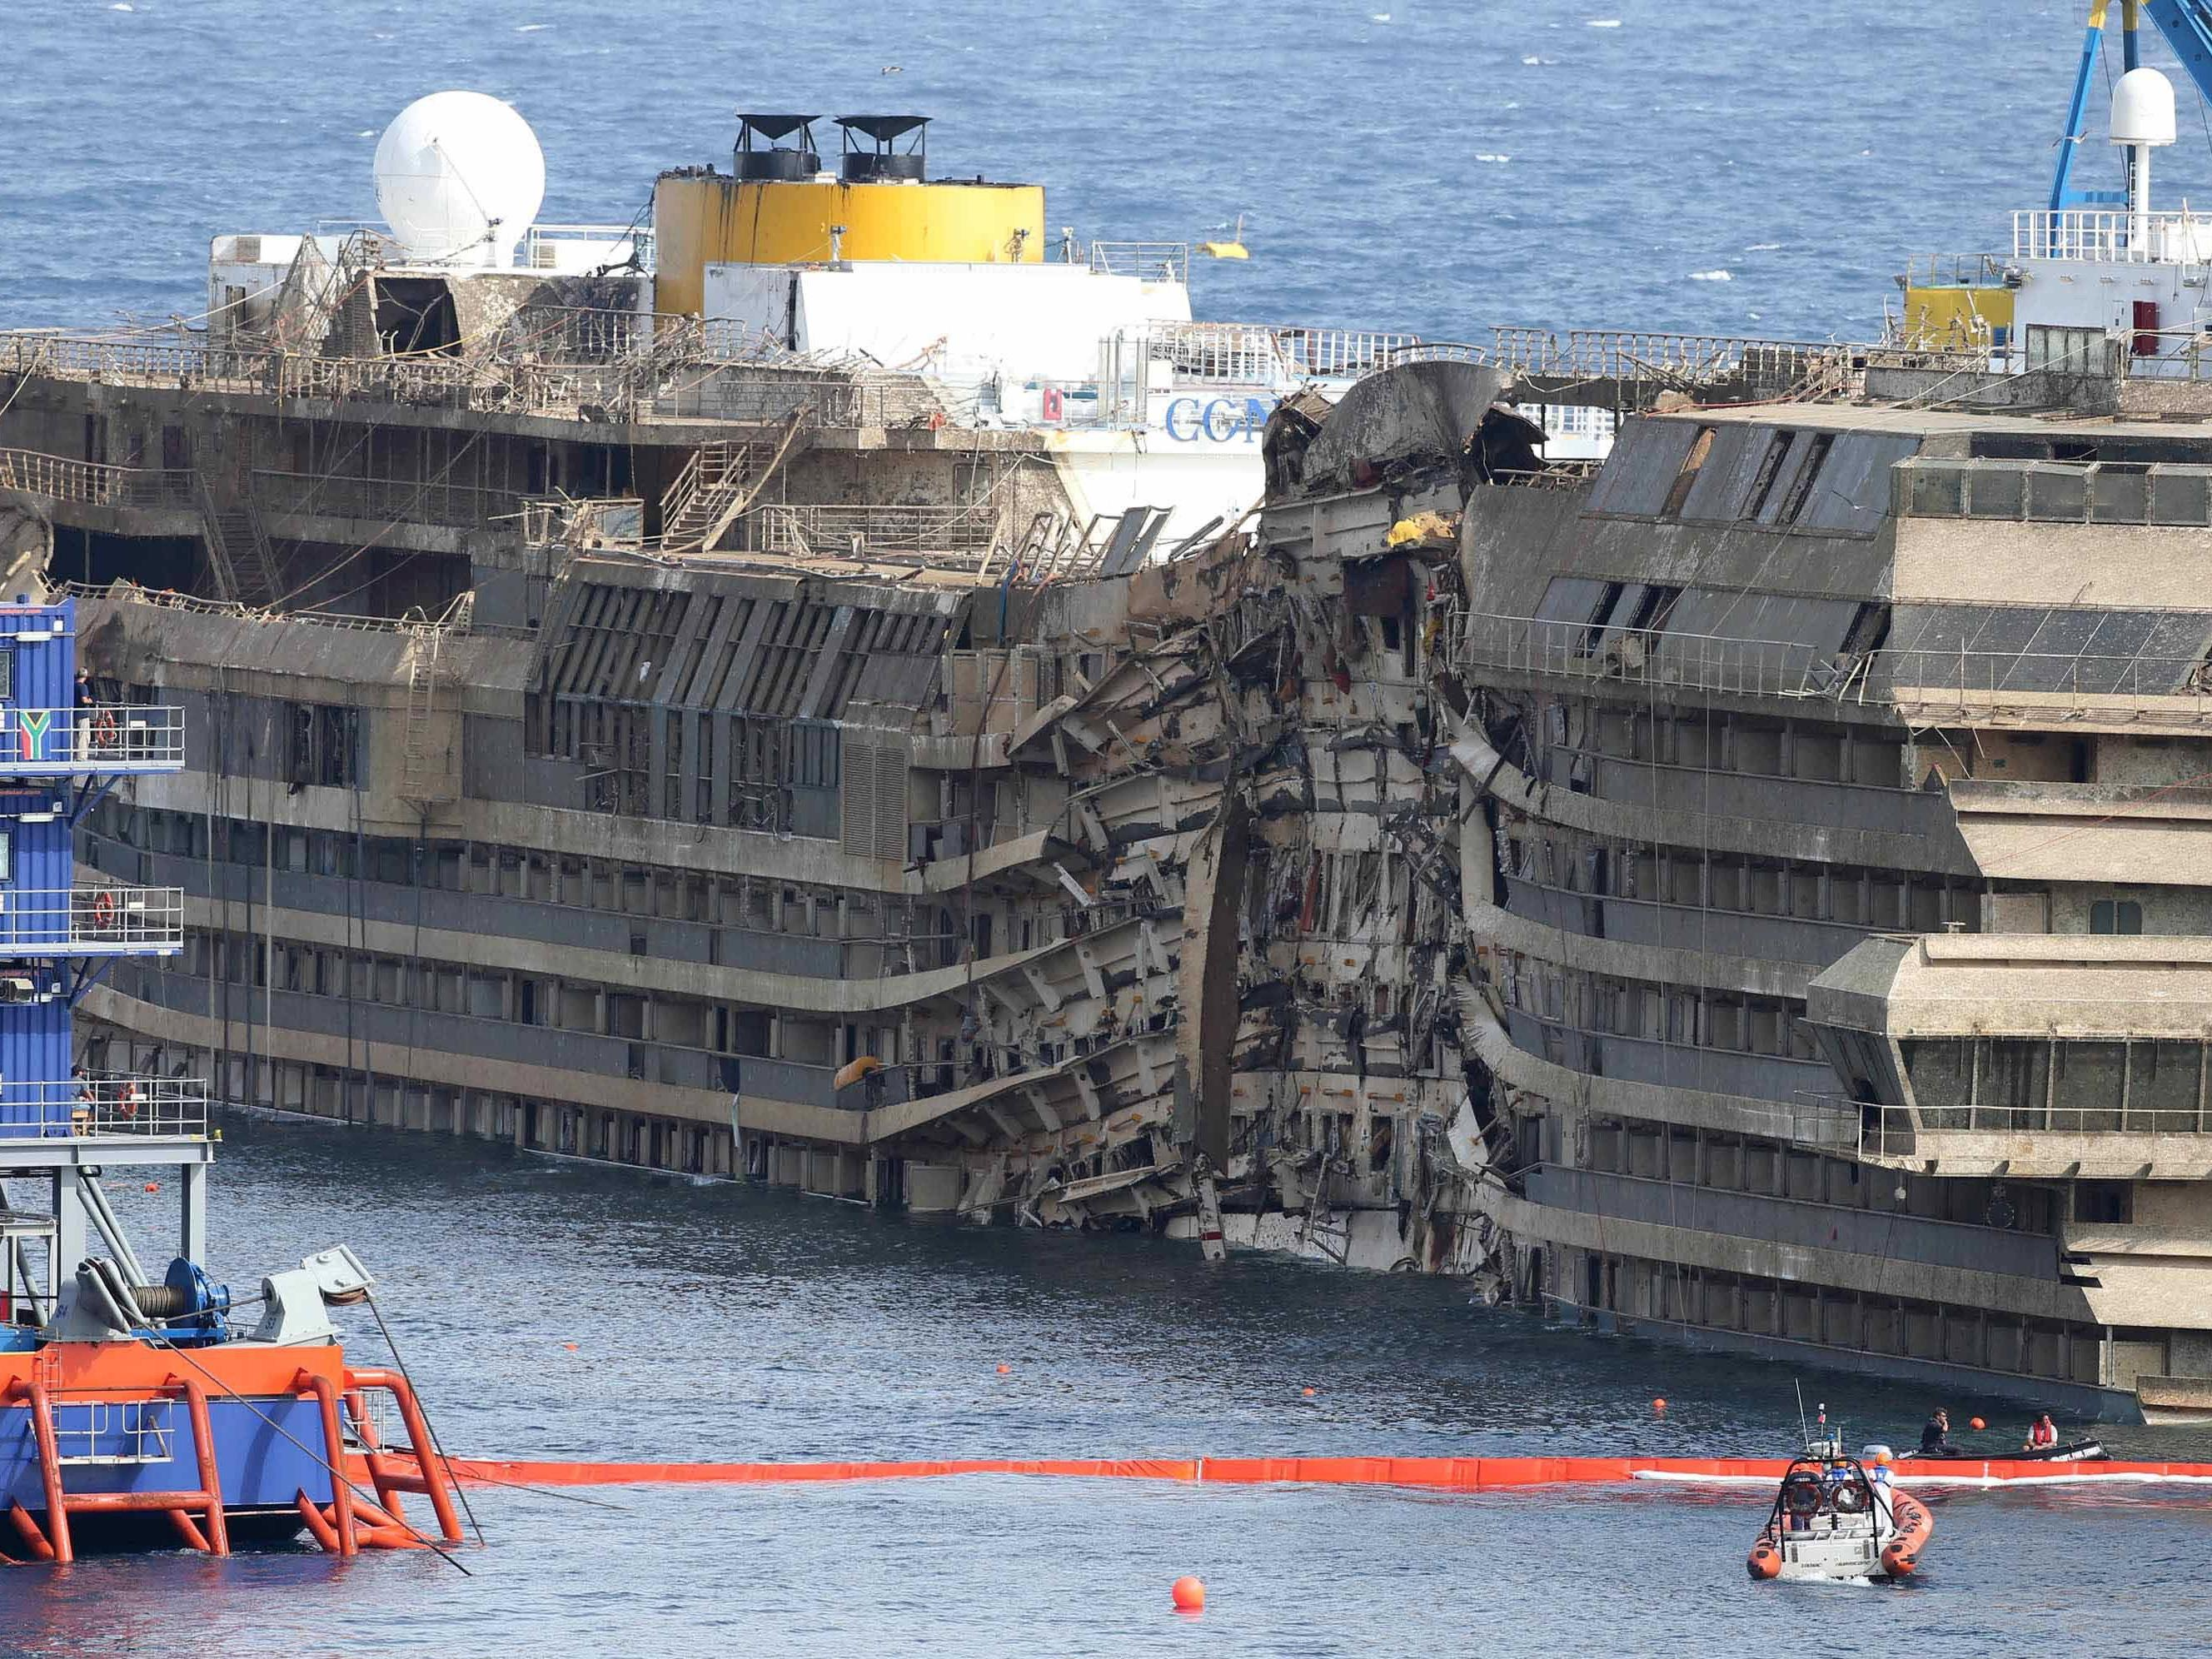 5.700 Tonnen Material wurden bereits aus dem Wrack entfernt.